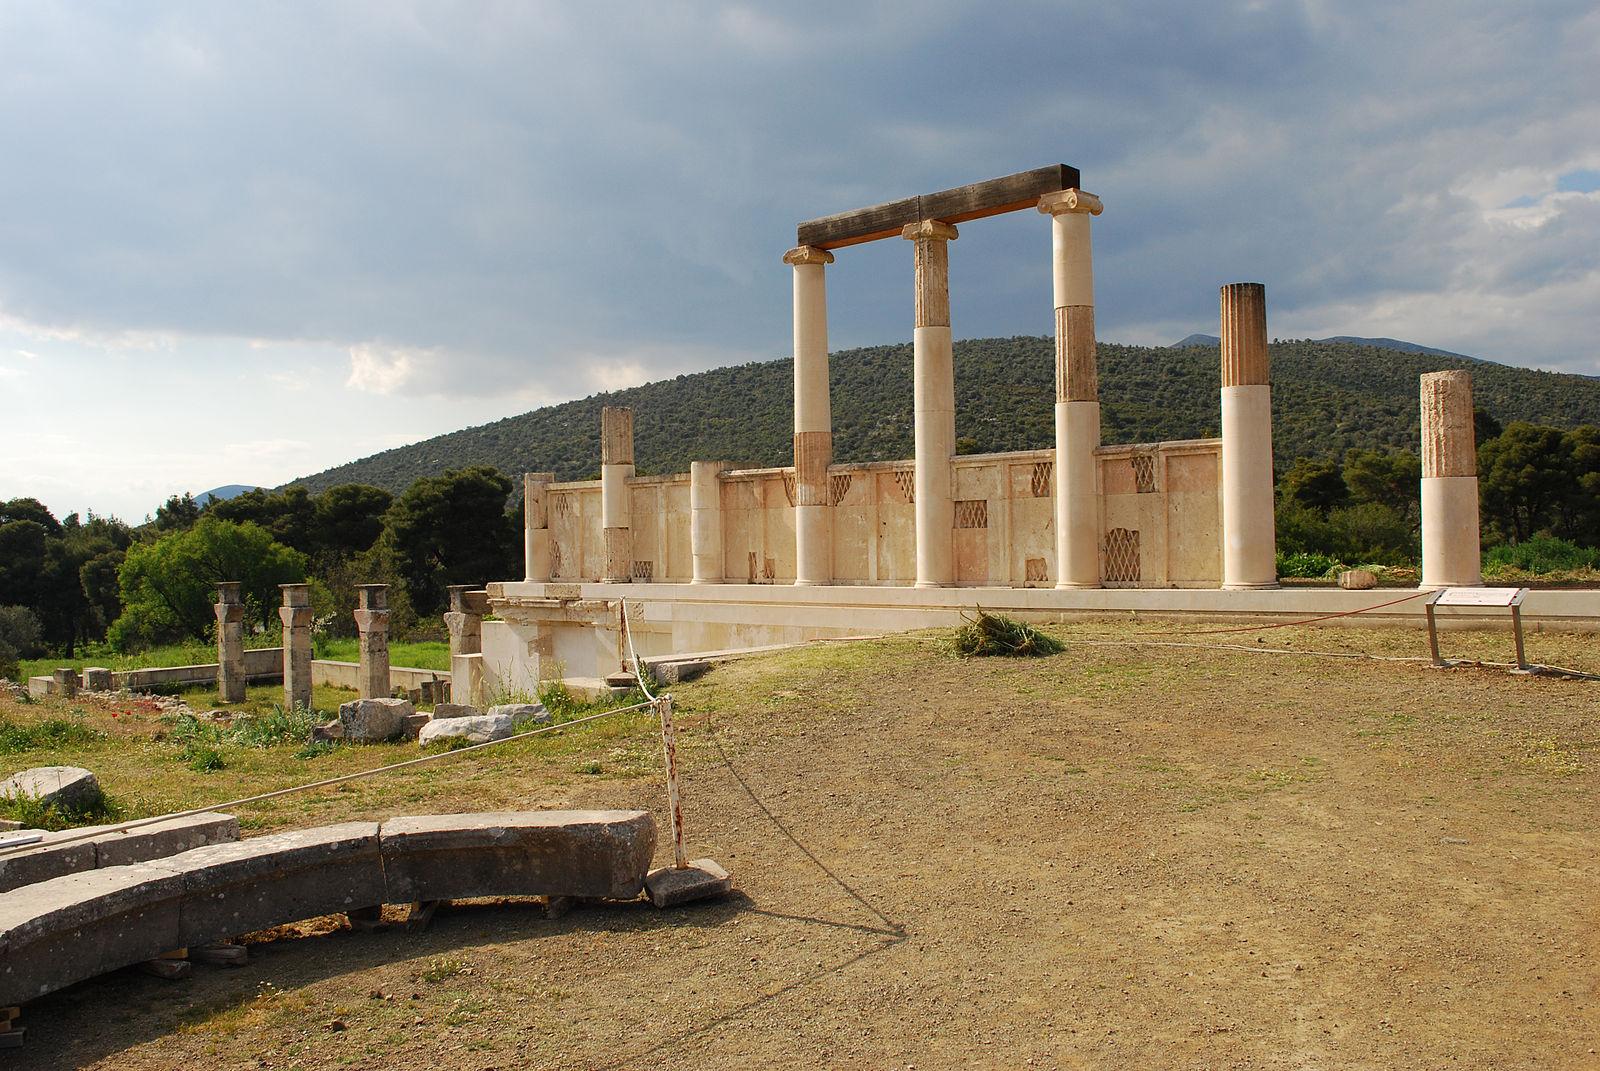 Epidaurus, Greece - Amazing south Balkans 18 days tour from Dubrovnik to Athens. Private minivan tour by Monterrasol Travel.